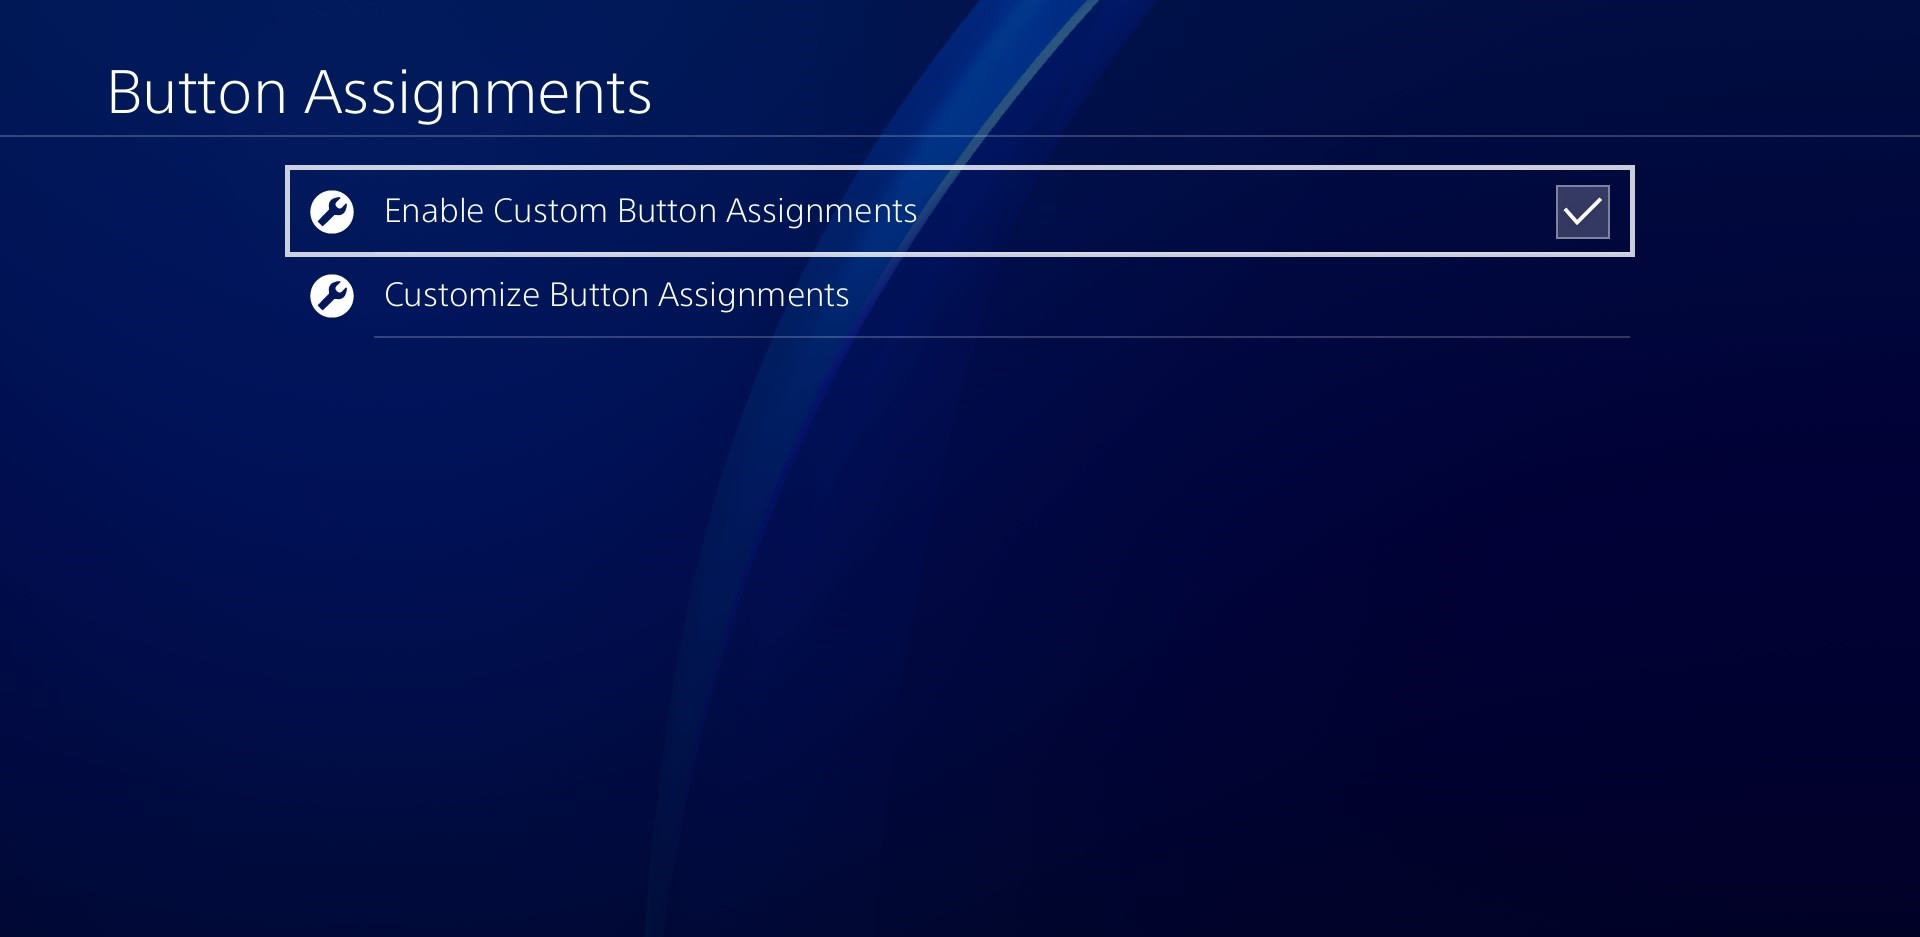 قم بتفعيل خانة Enable Custom Button Assignments